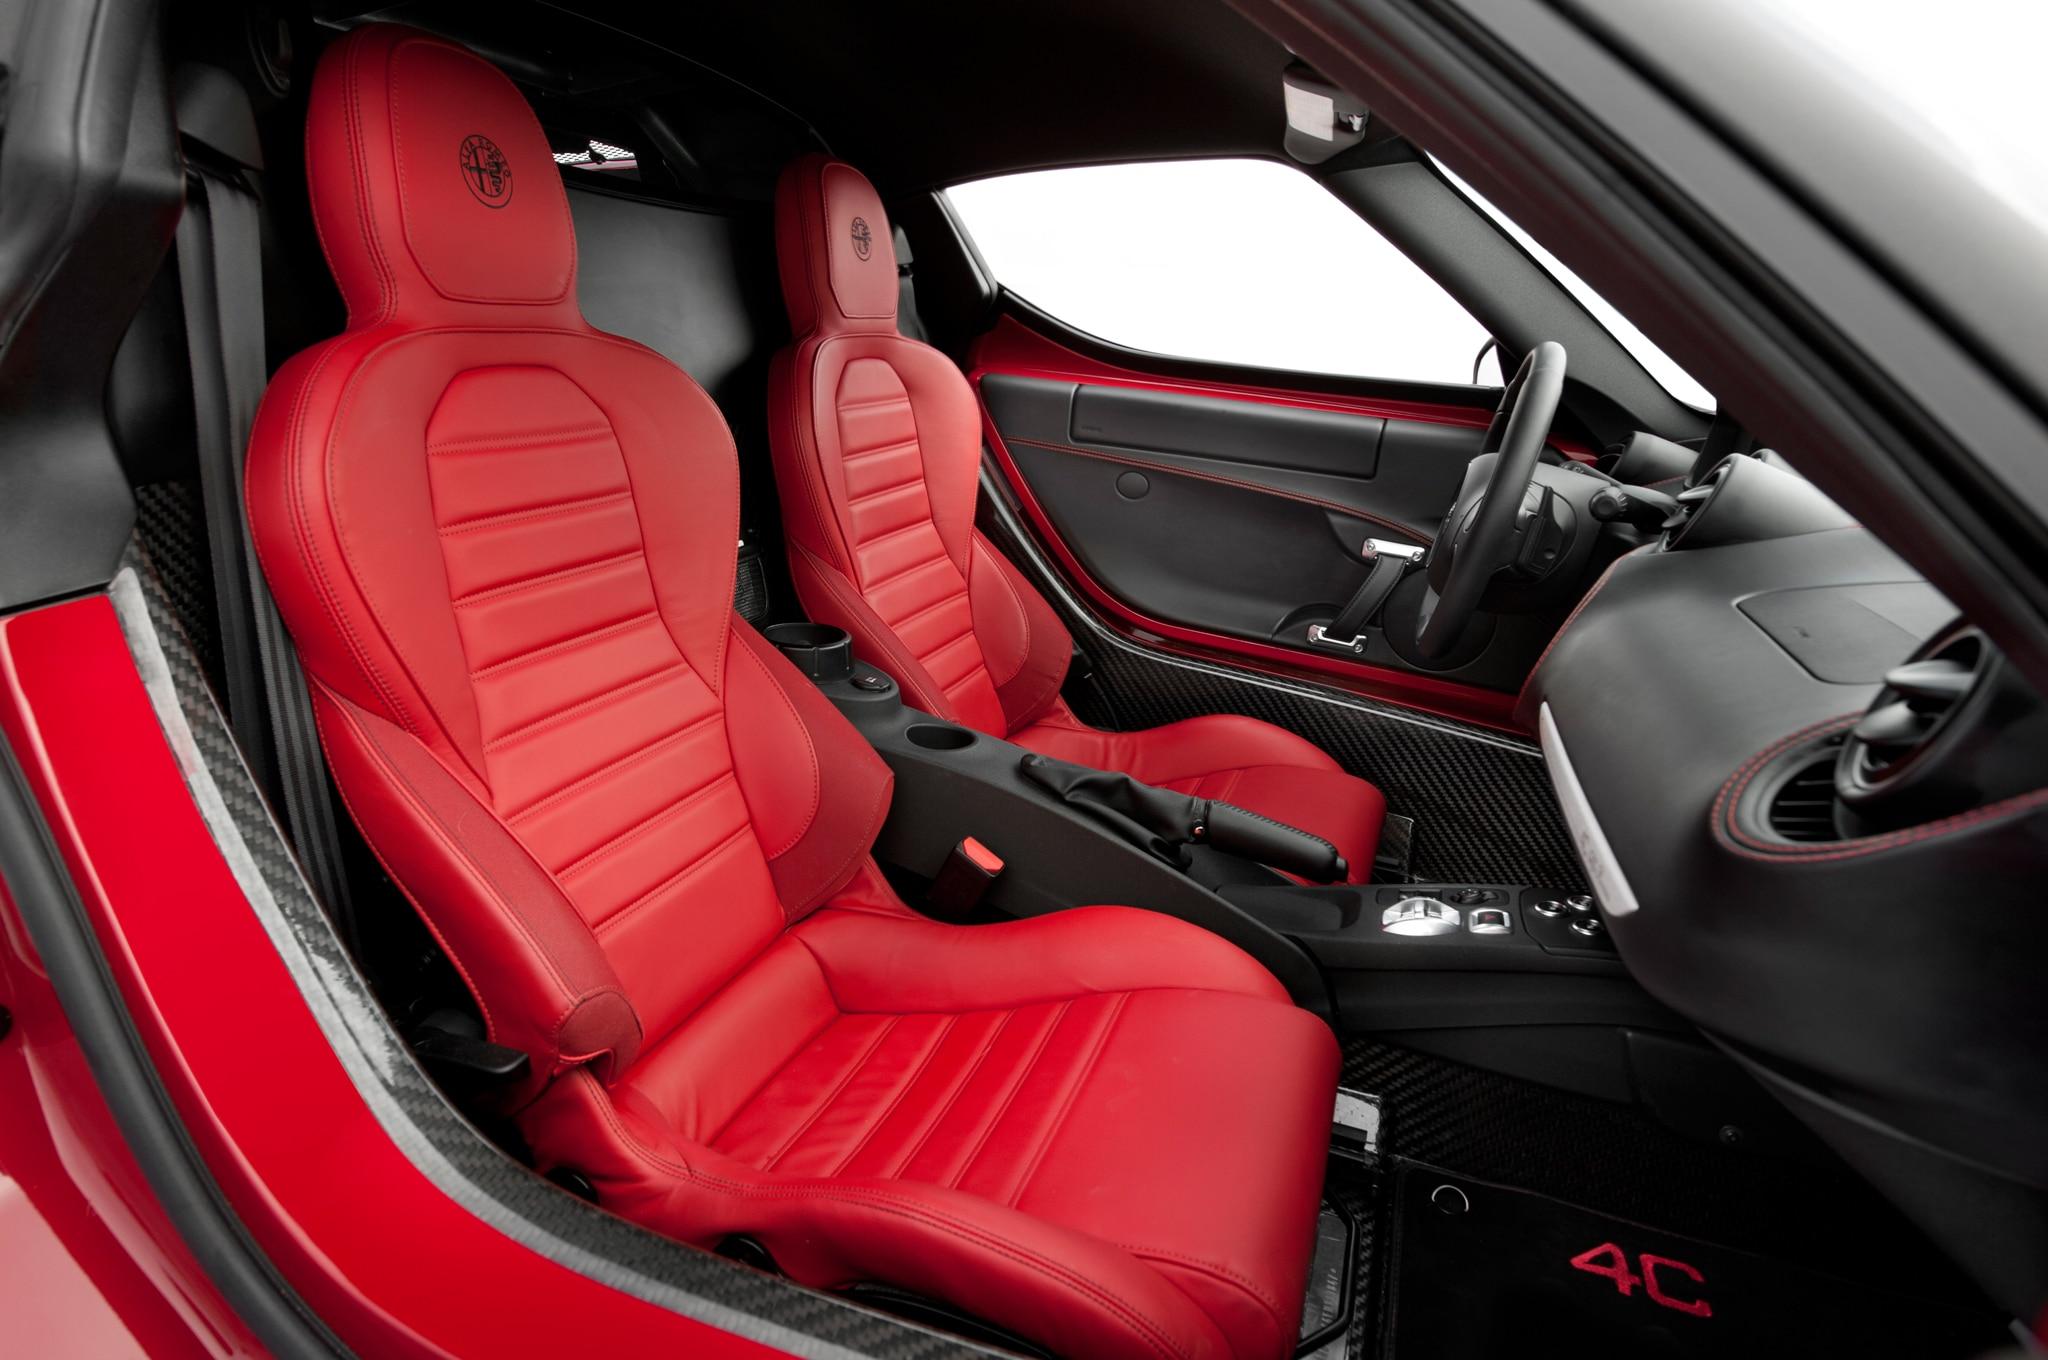 Alfa Romeo C Seats on Alfa Romeo Spider Transmission Mount